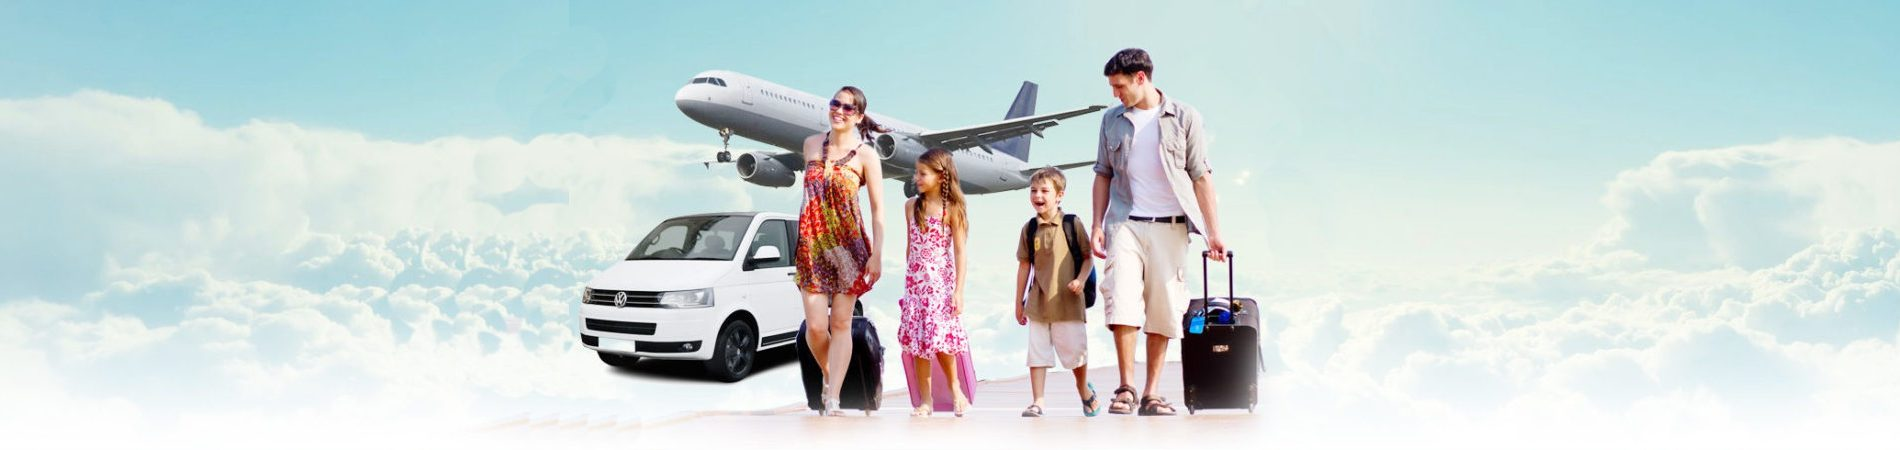 airport to Hotel transfer shuttle Majorca, Alicante, Antalya and Bangkok